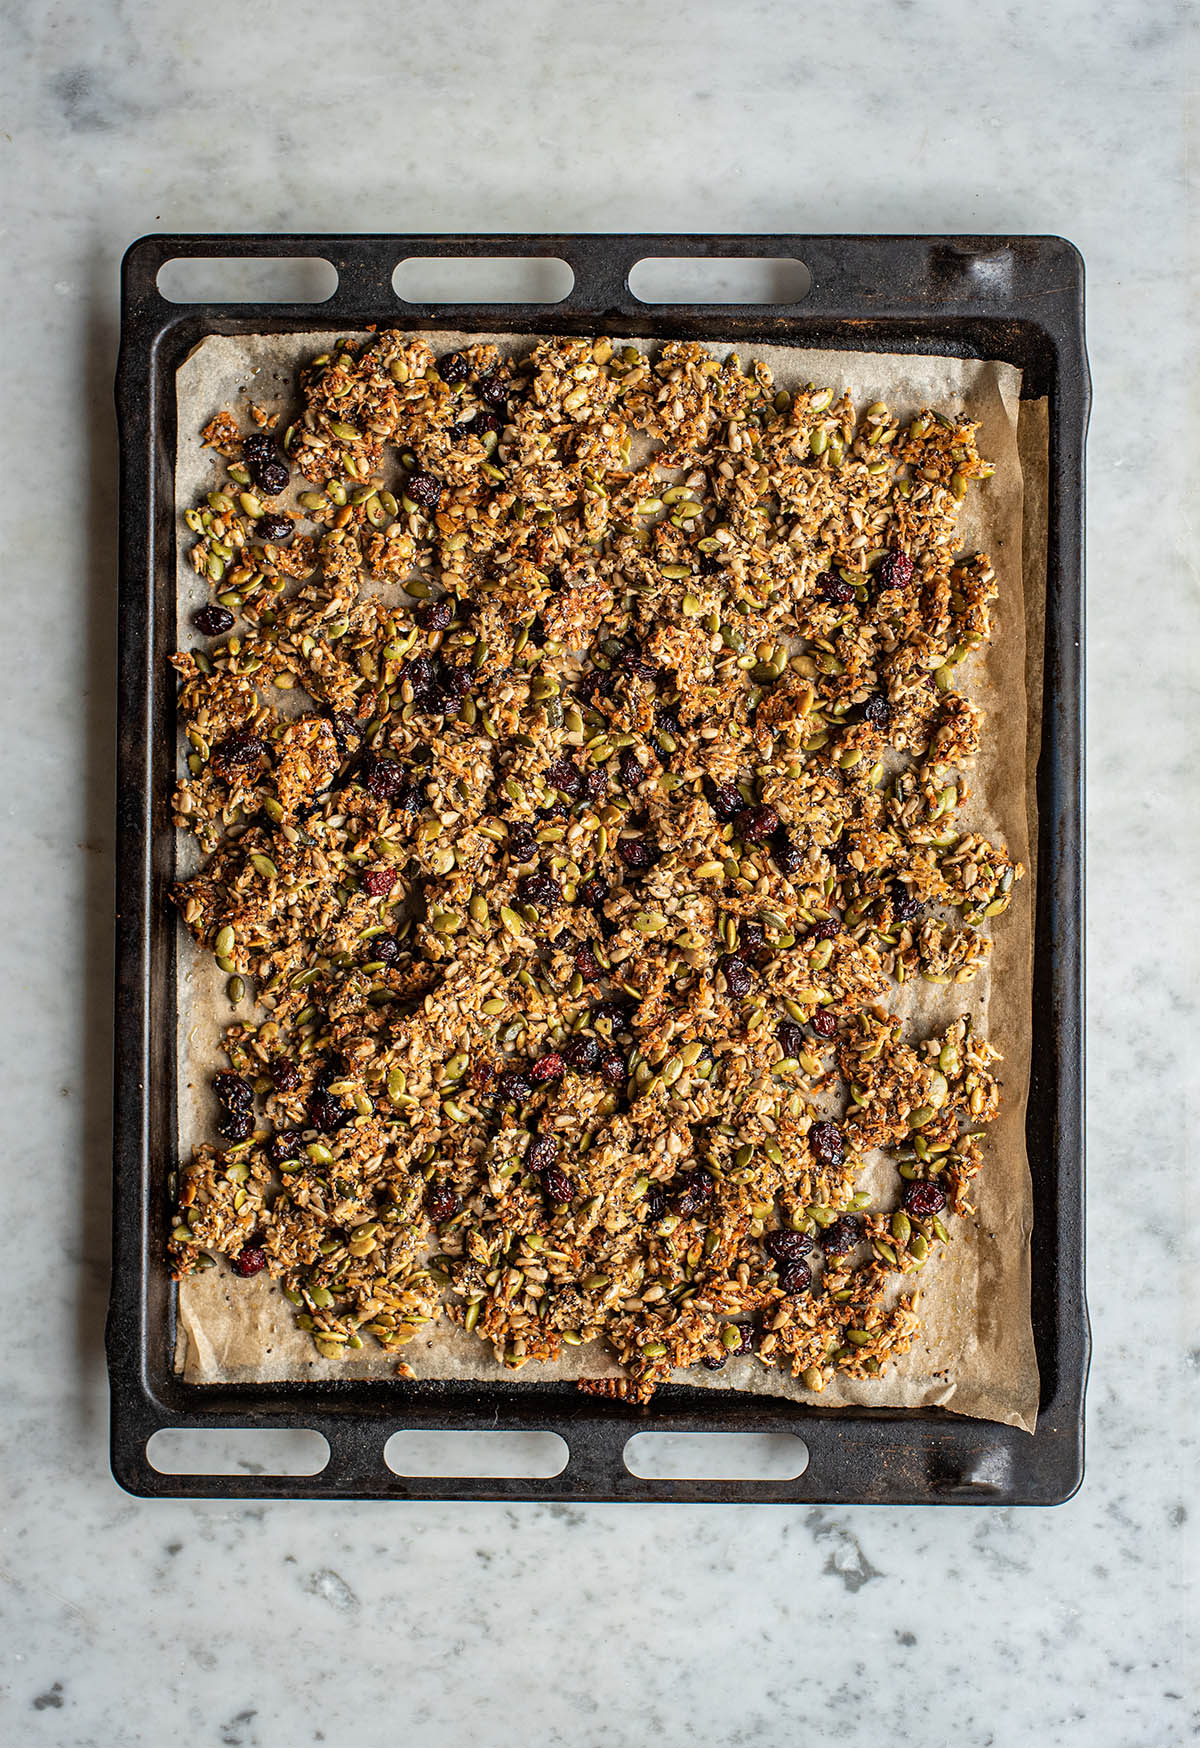 Granola on a large sheet pan, baked.